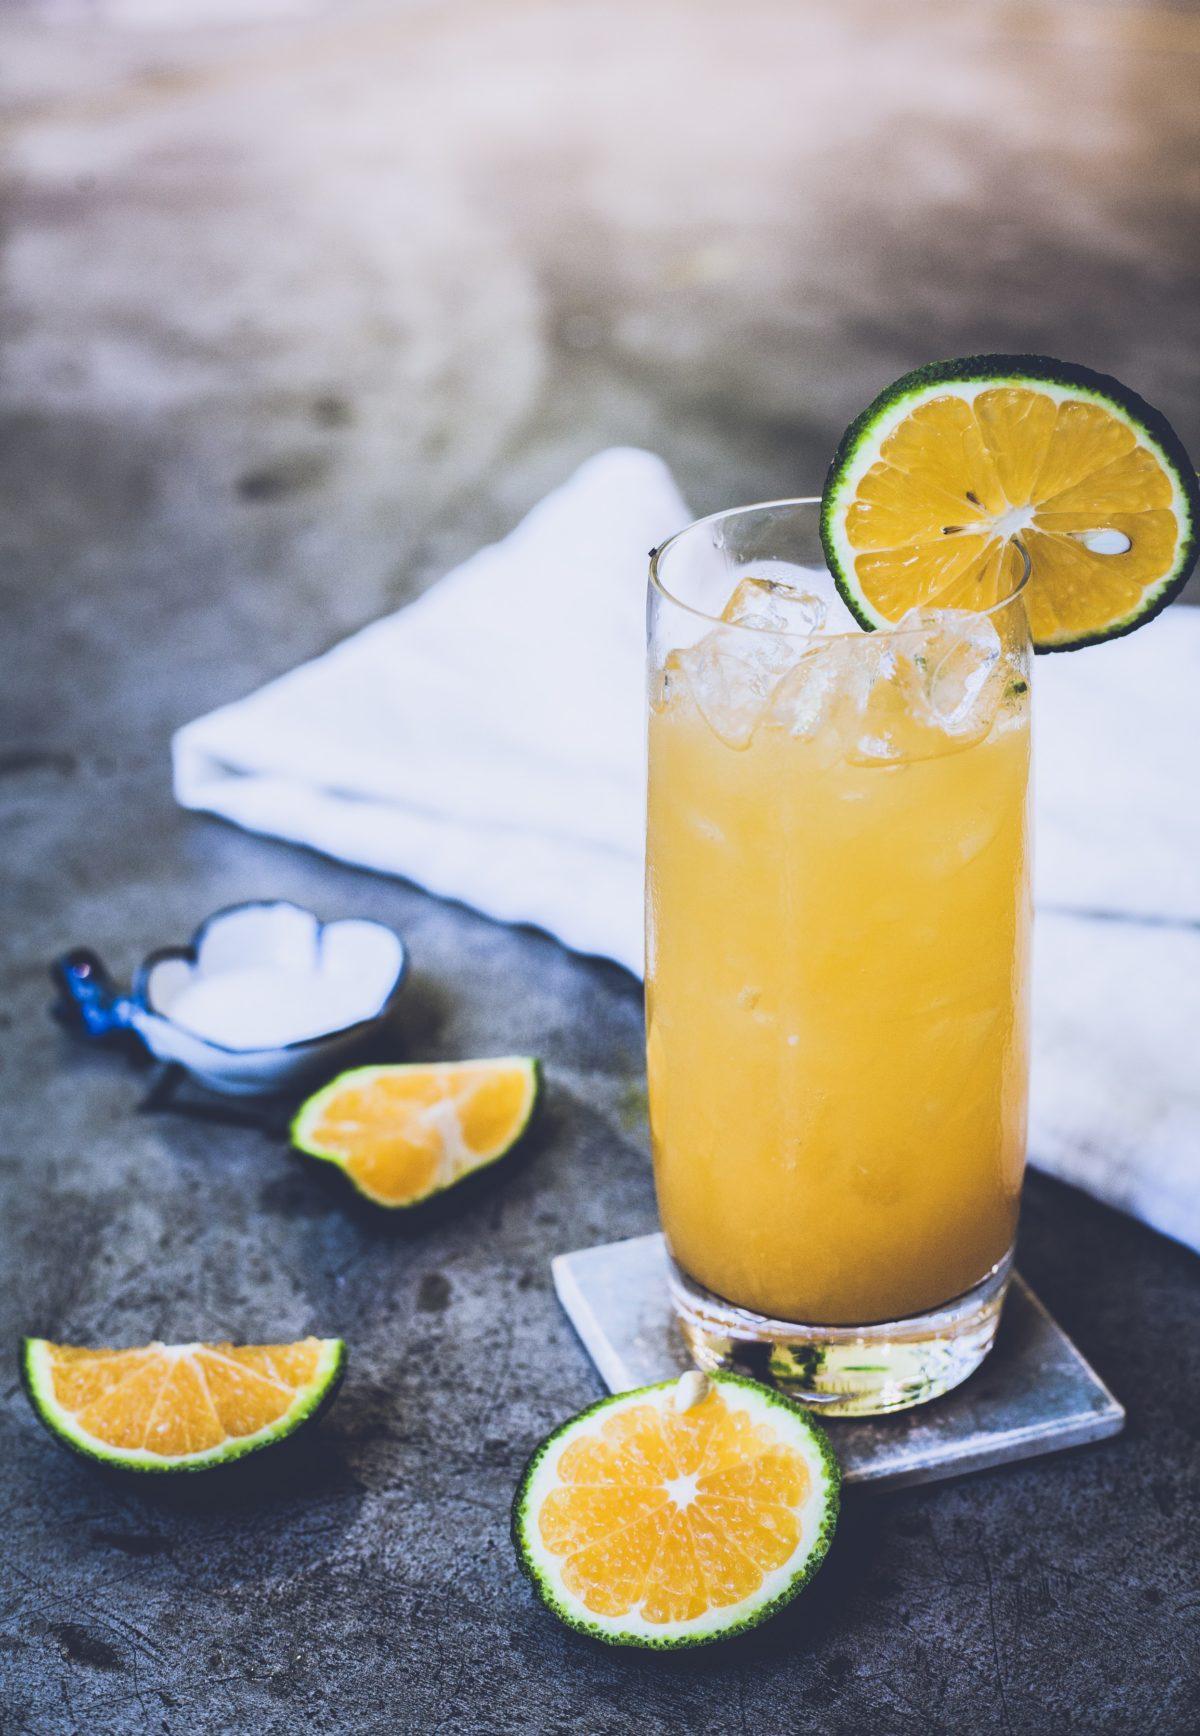 centrifugeuse jus fruit orange citron vert presse agrume extracteur de jus recette mocktail